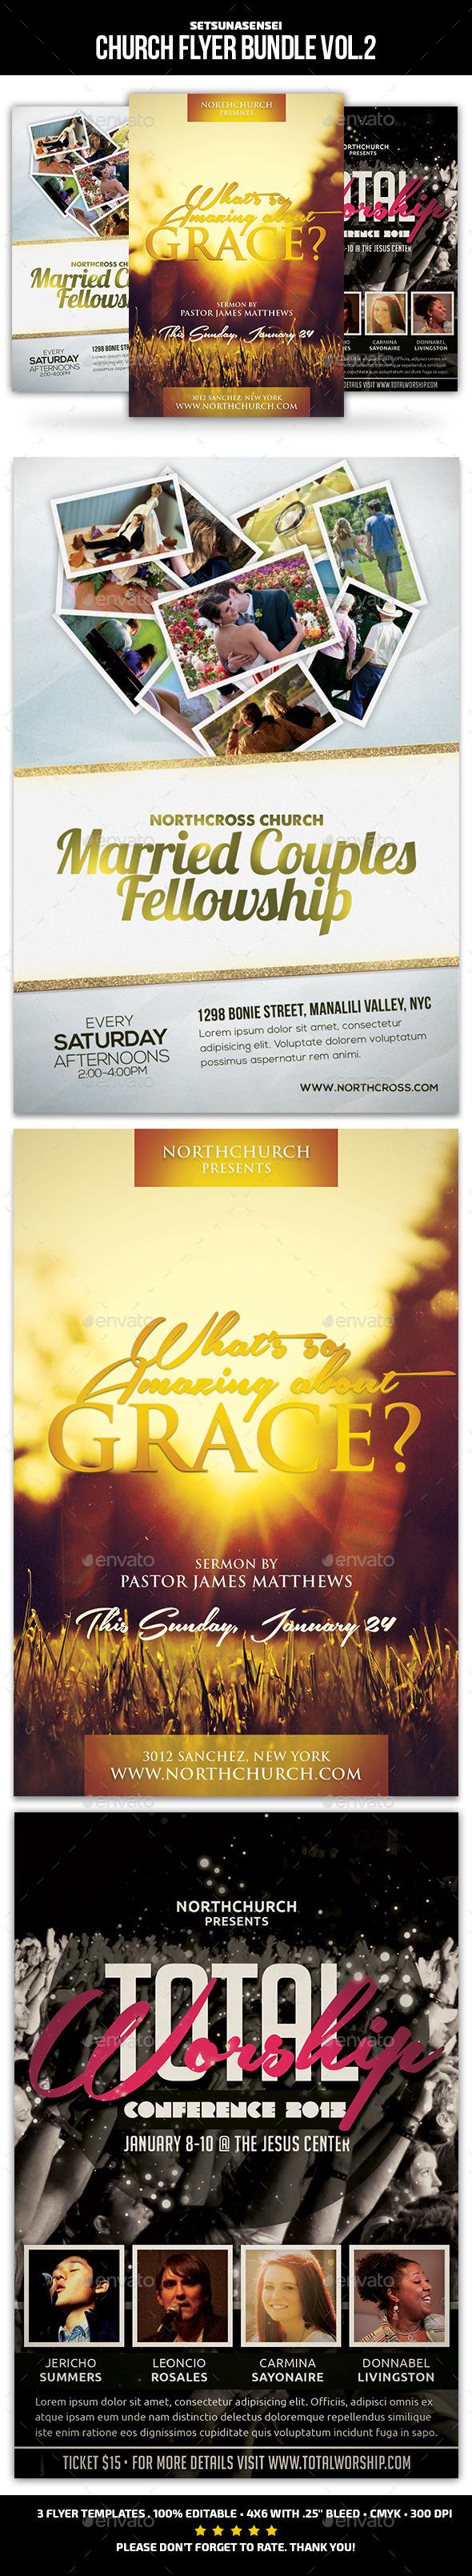 Church Flyer Bundle Vol 2